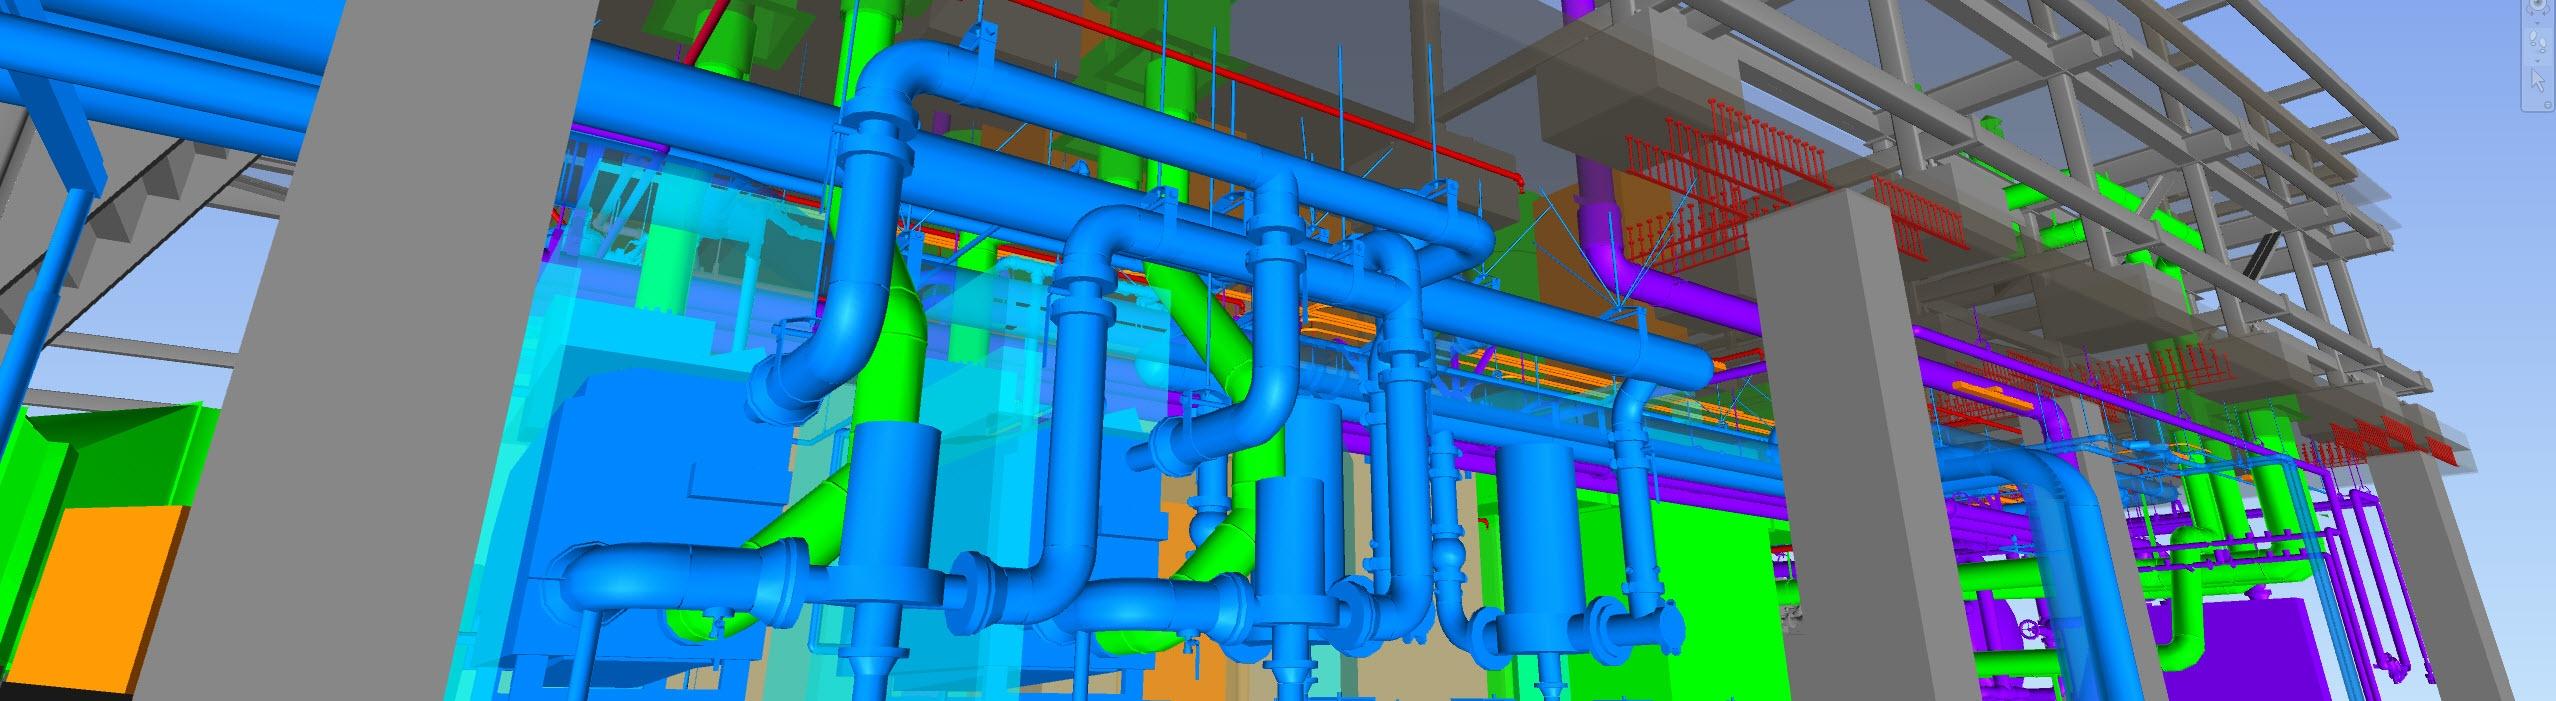 BIM Plumbing Design